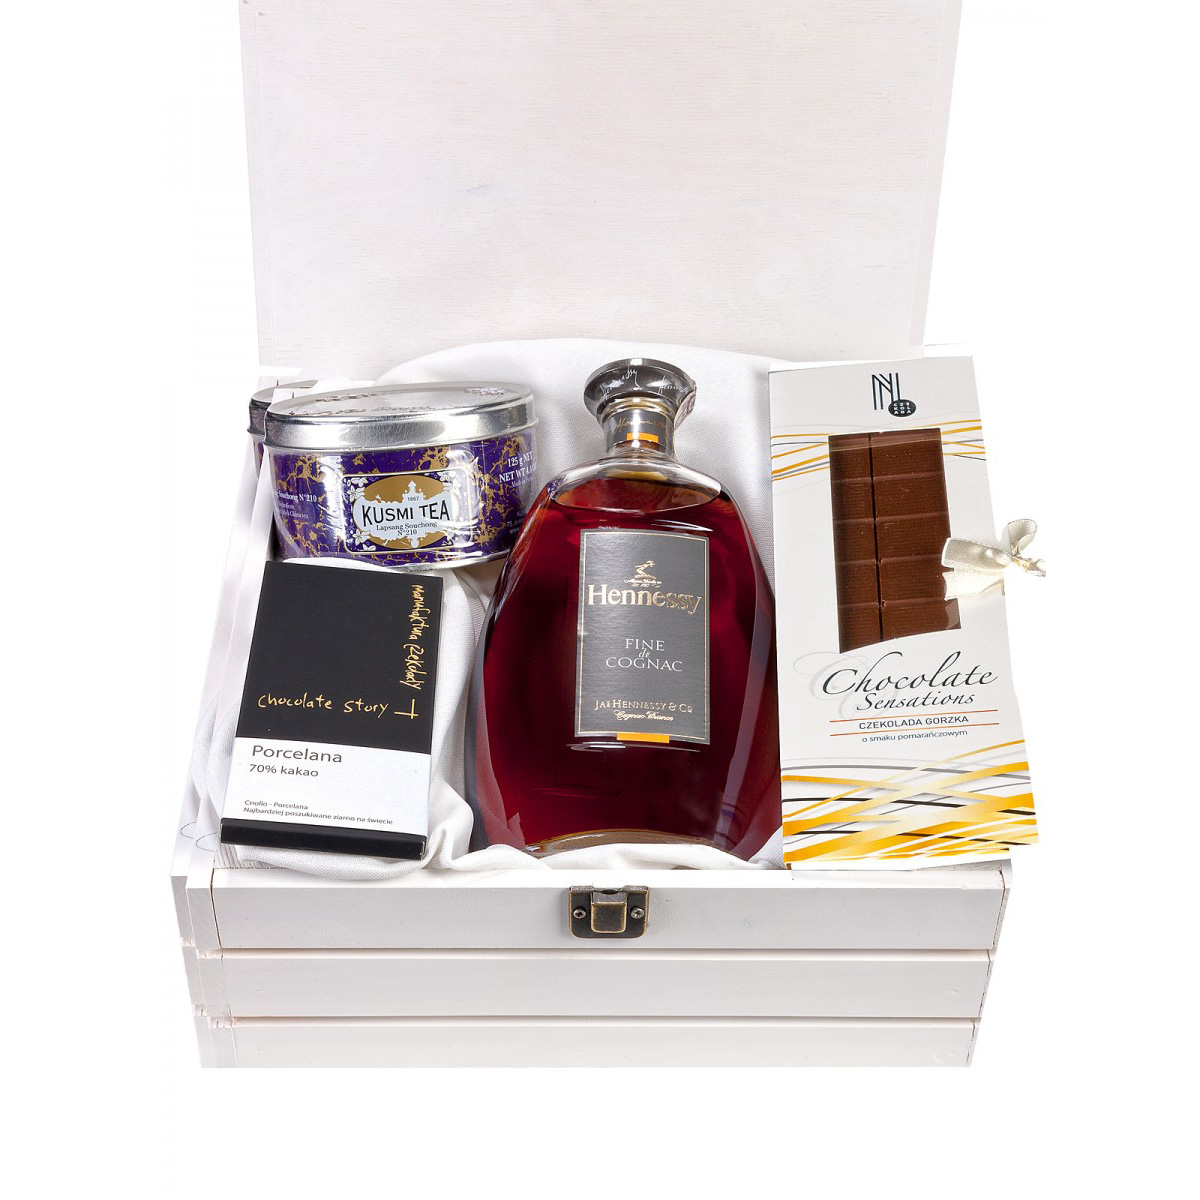 Zestaw prezentowy Hennessy Fine de Cognac